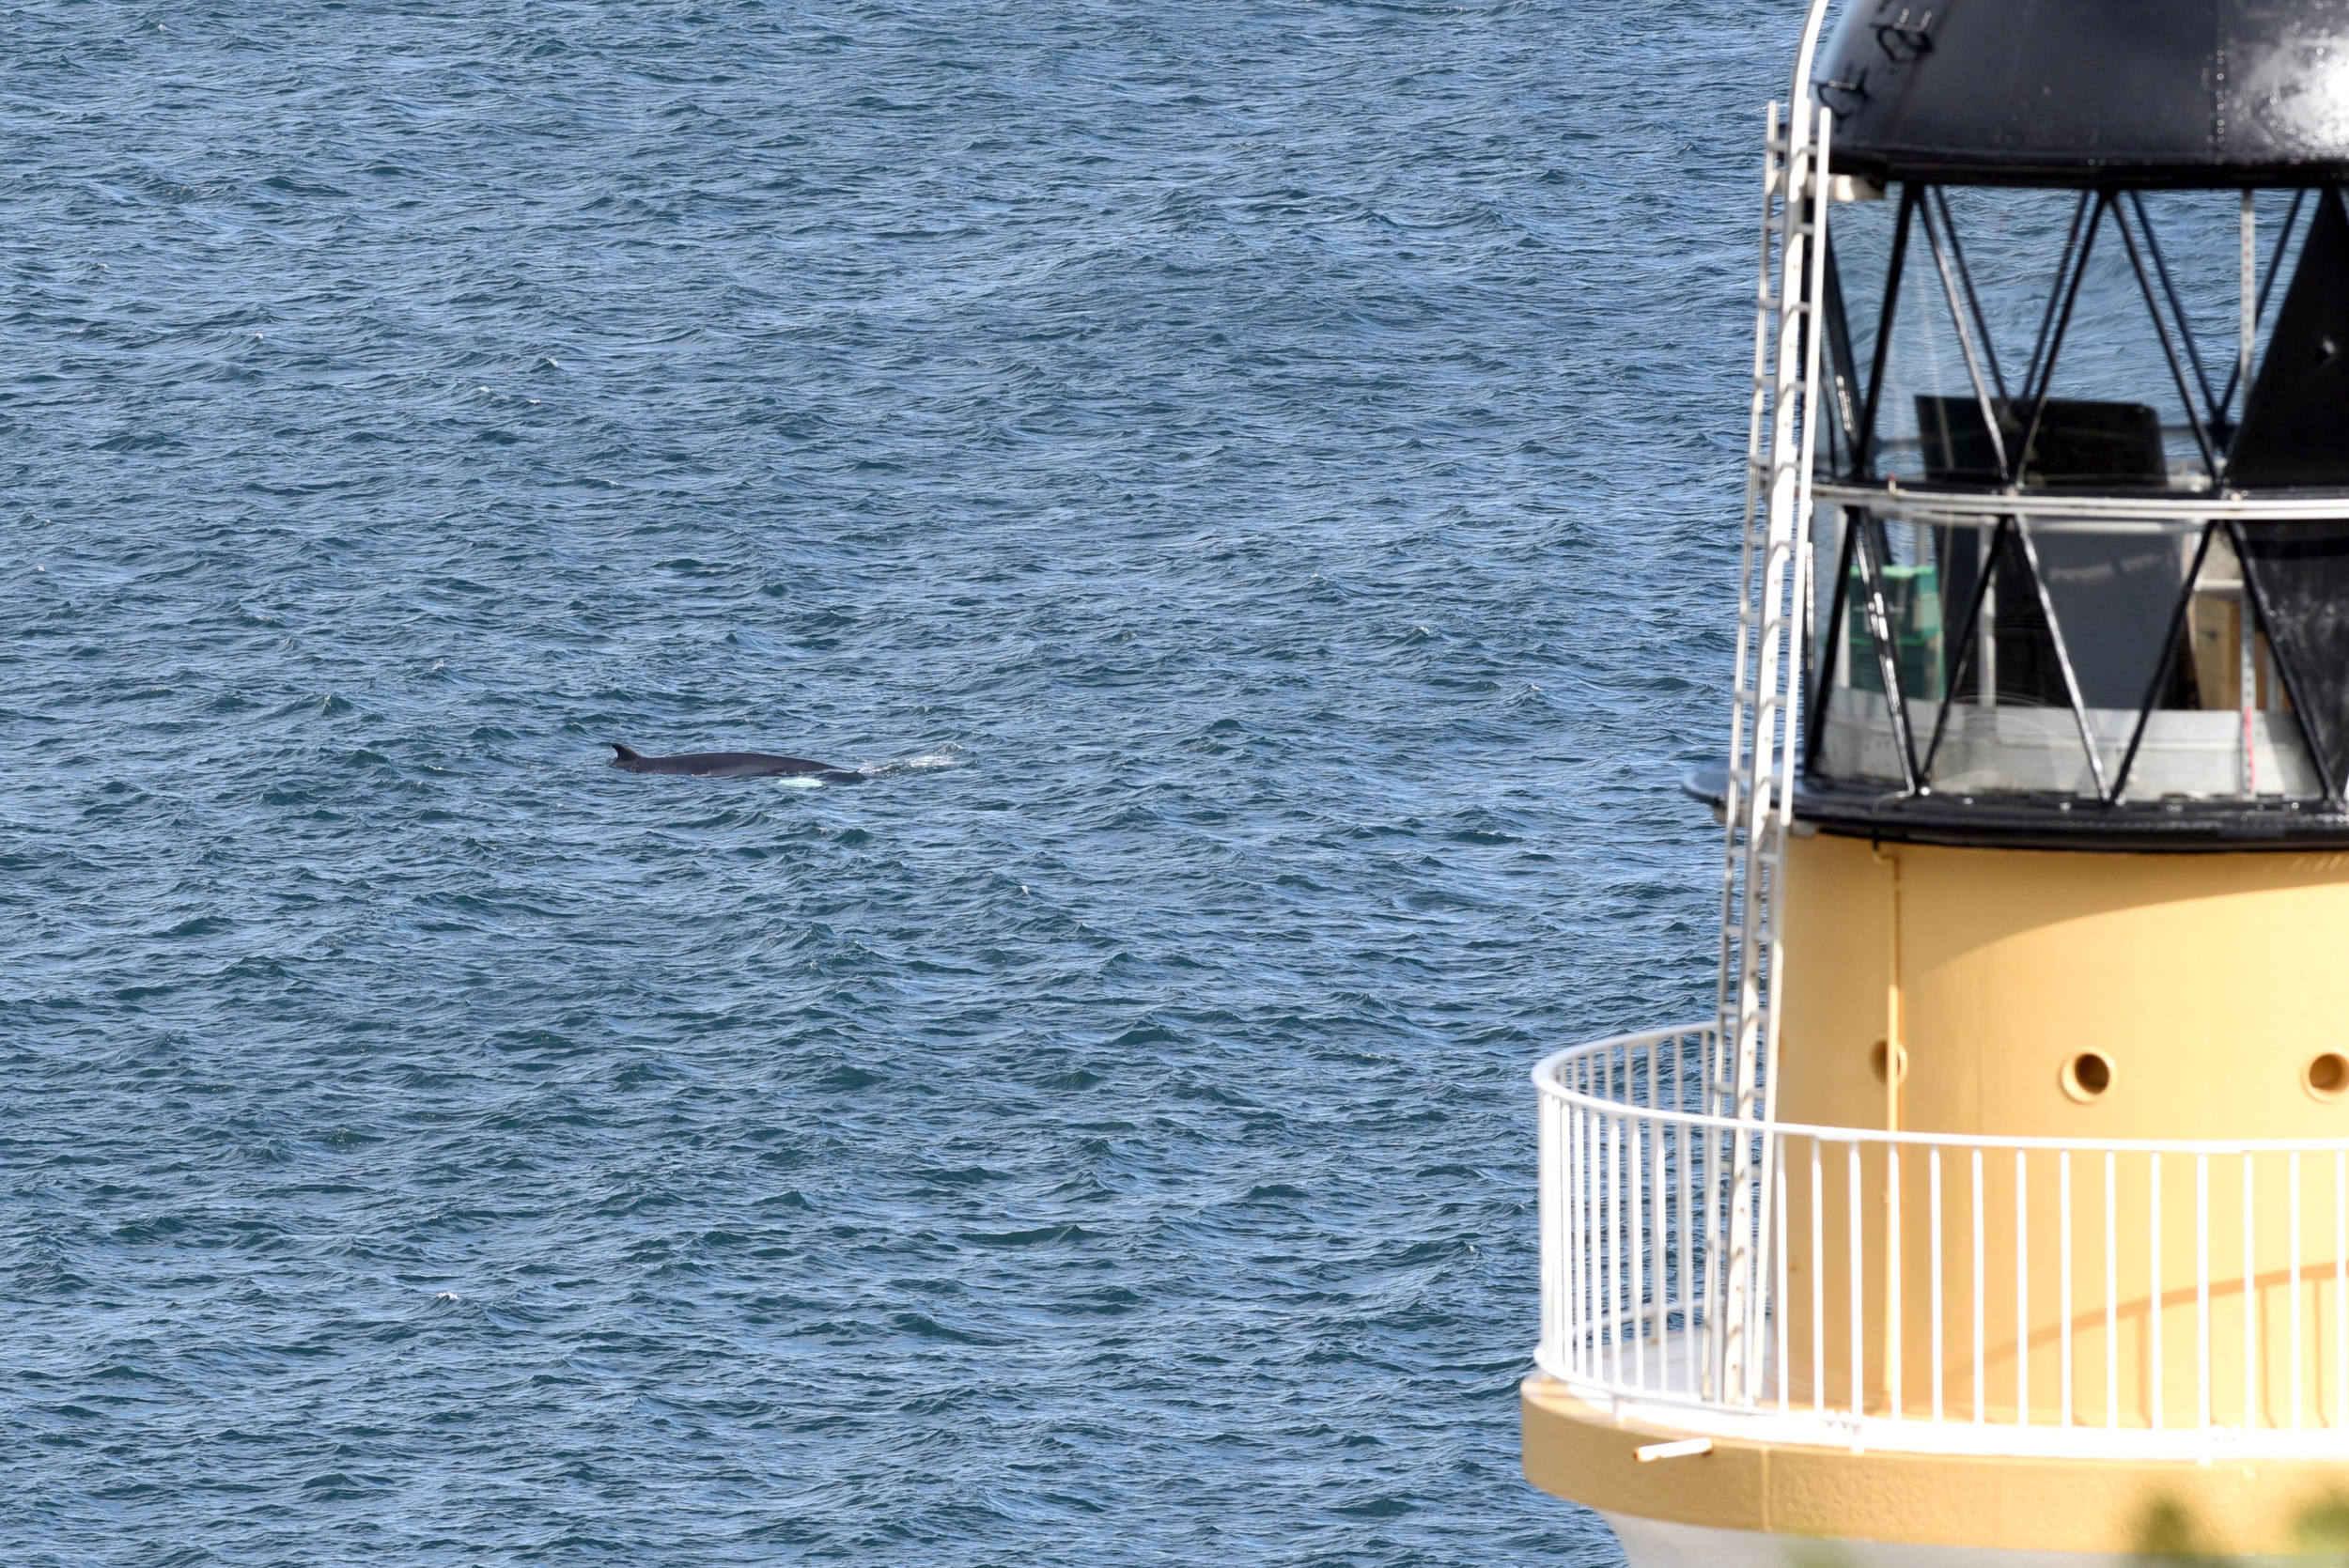 A minke whale feeding near Douglas Head